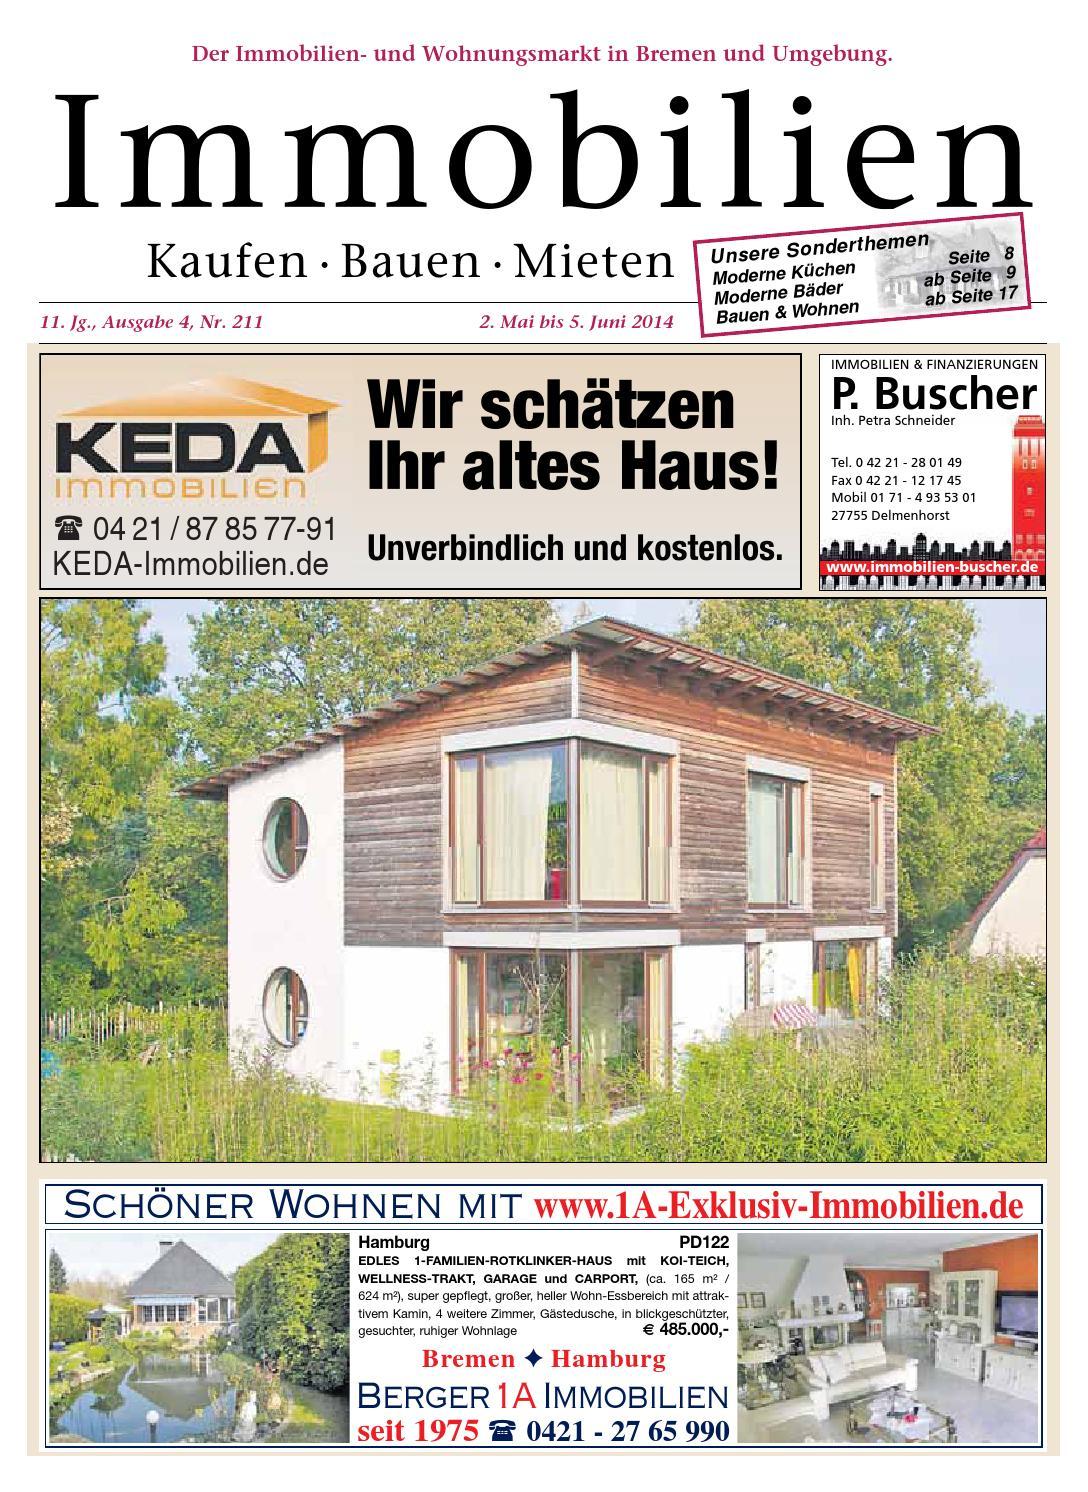 Immobilien - Kaufen -Bauen -Mieten by KPS ...